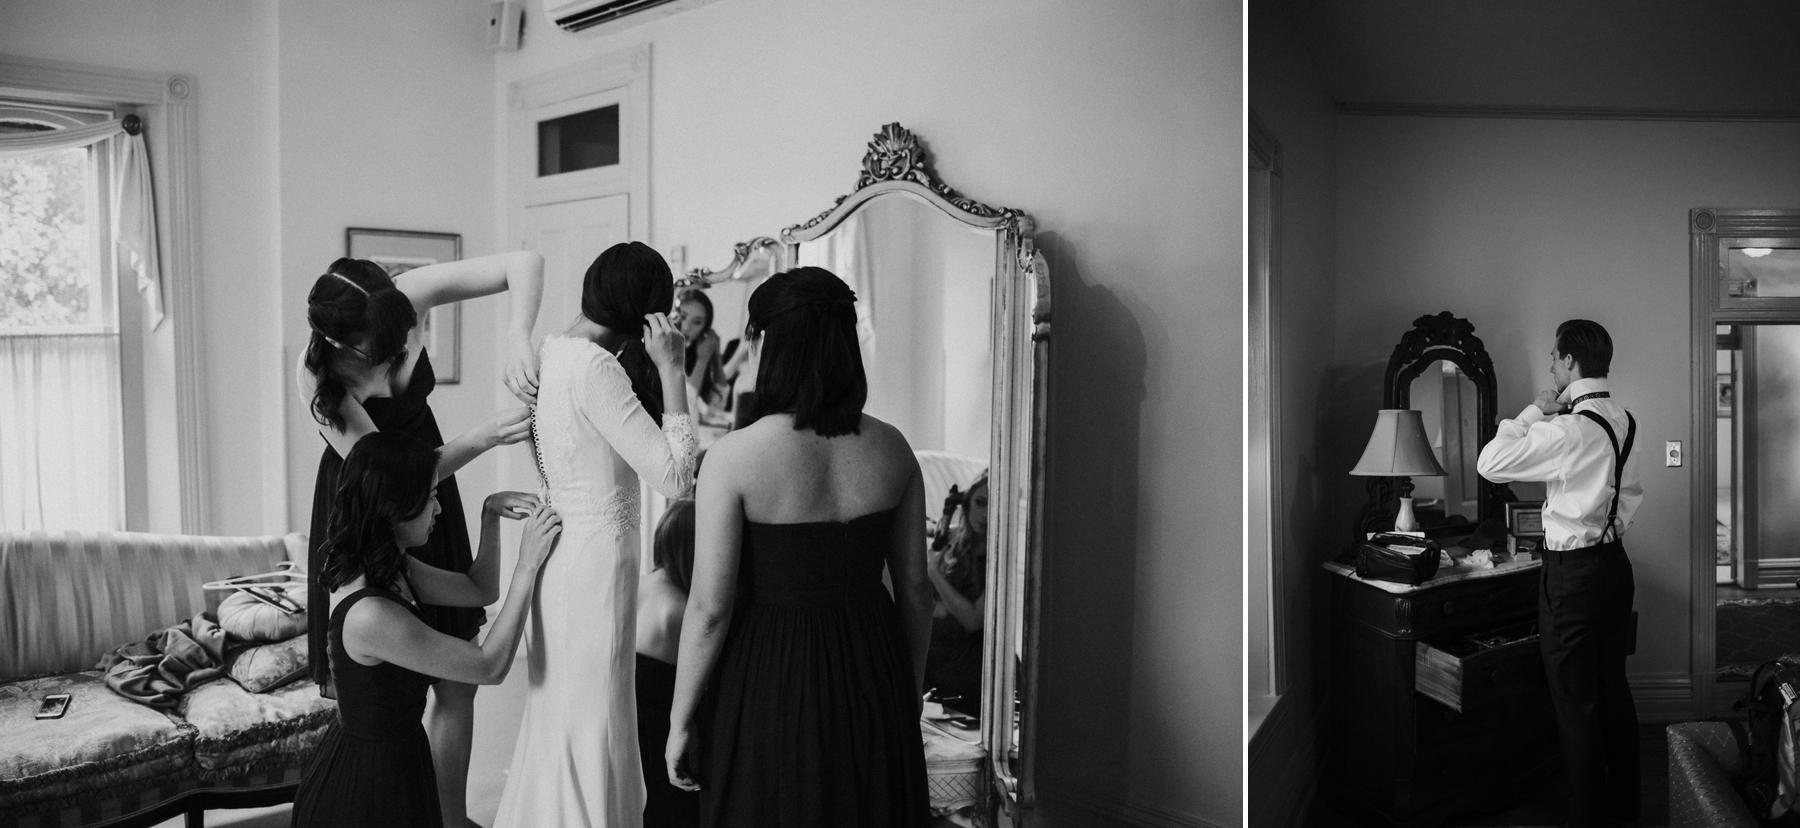 washington_dc_ceresville_mansion_wedding_photography 10.jpg